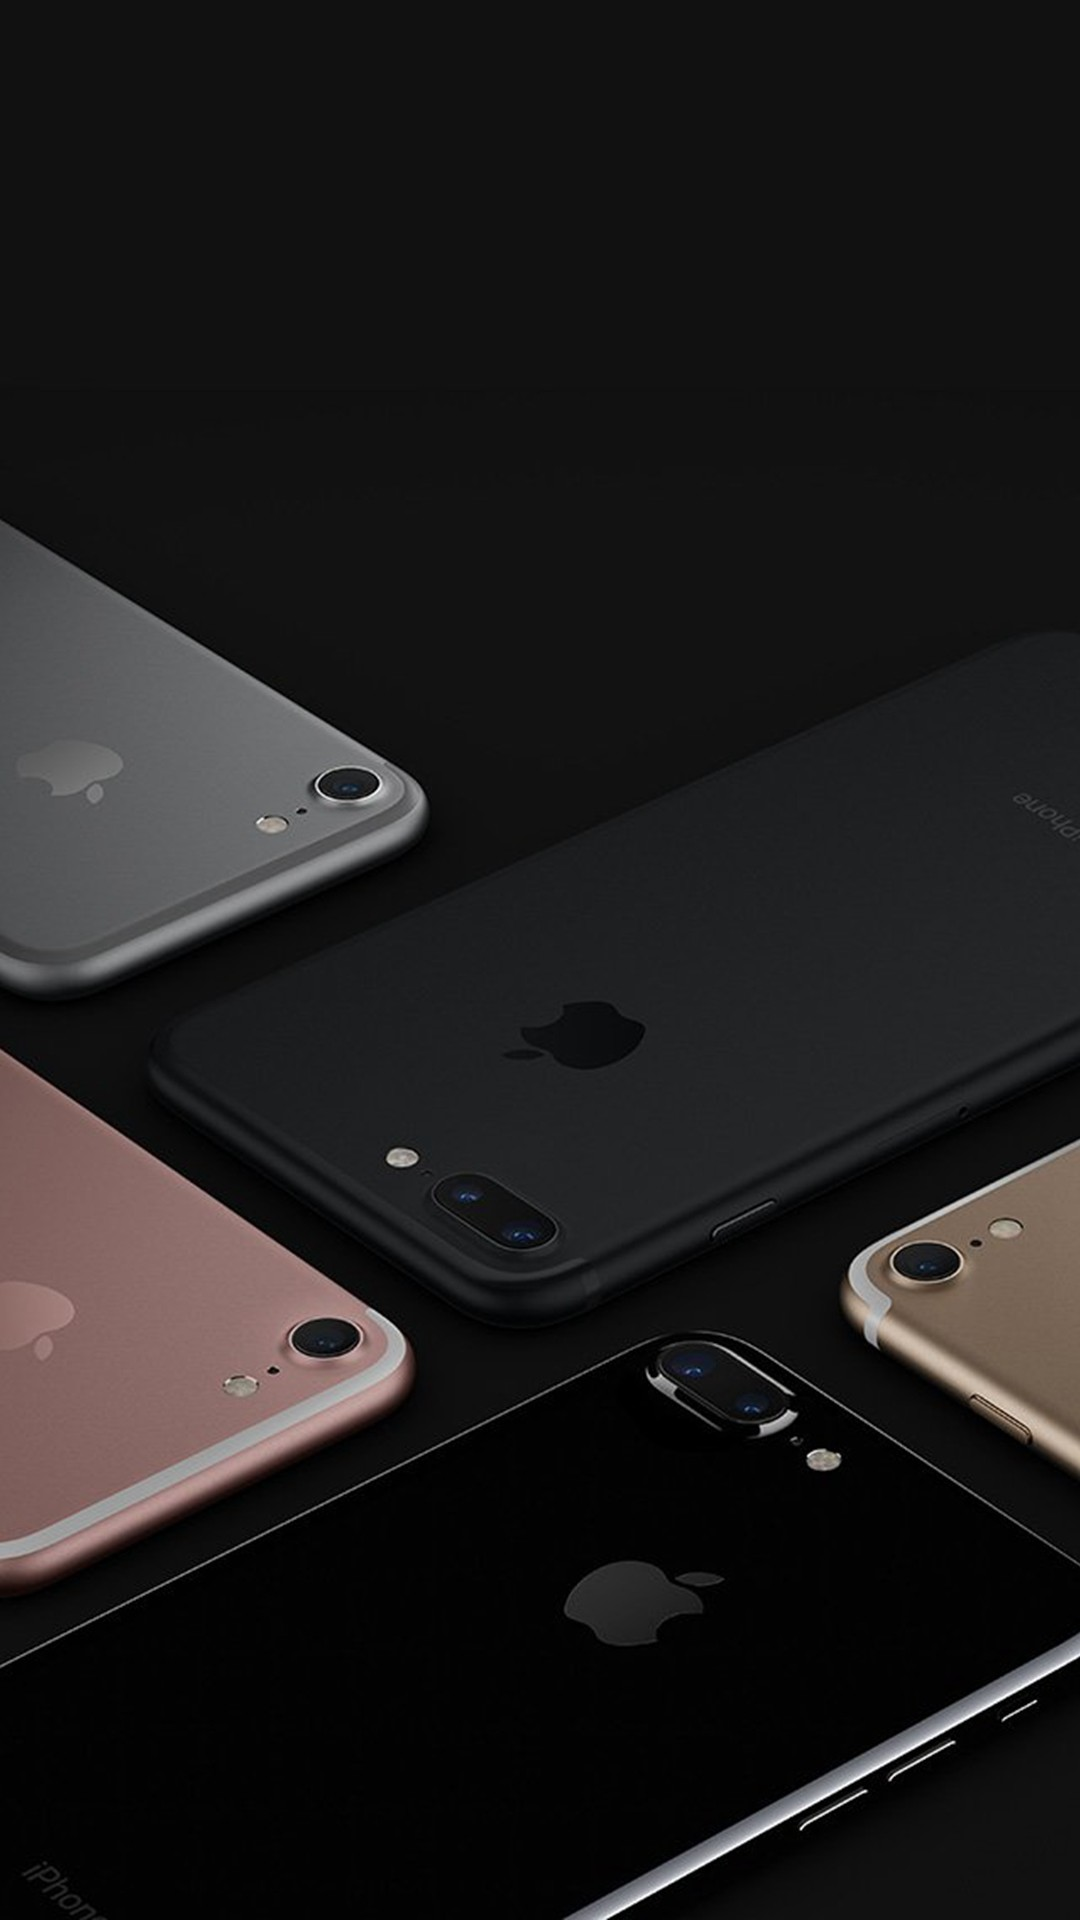 Apple iphone7 Jetblack Gold Pink Silver Dark iOS10 Art Illustration #iPhone  #6 #plus